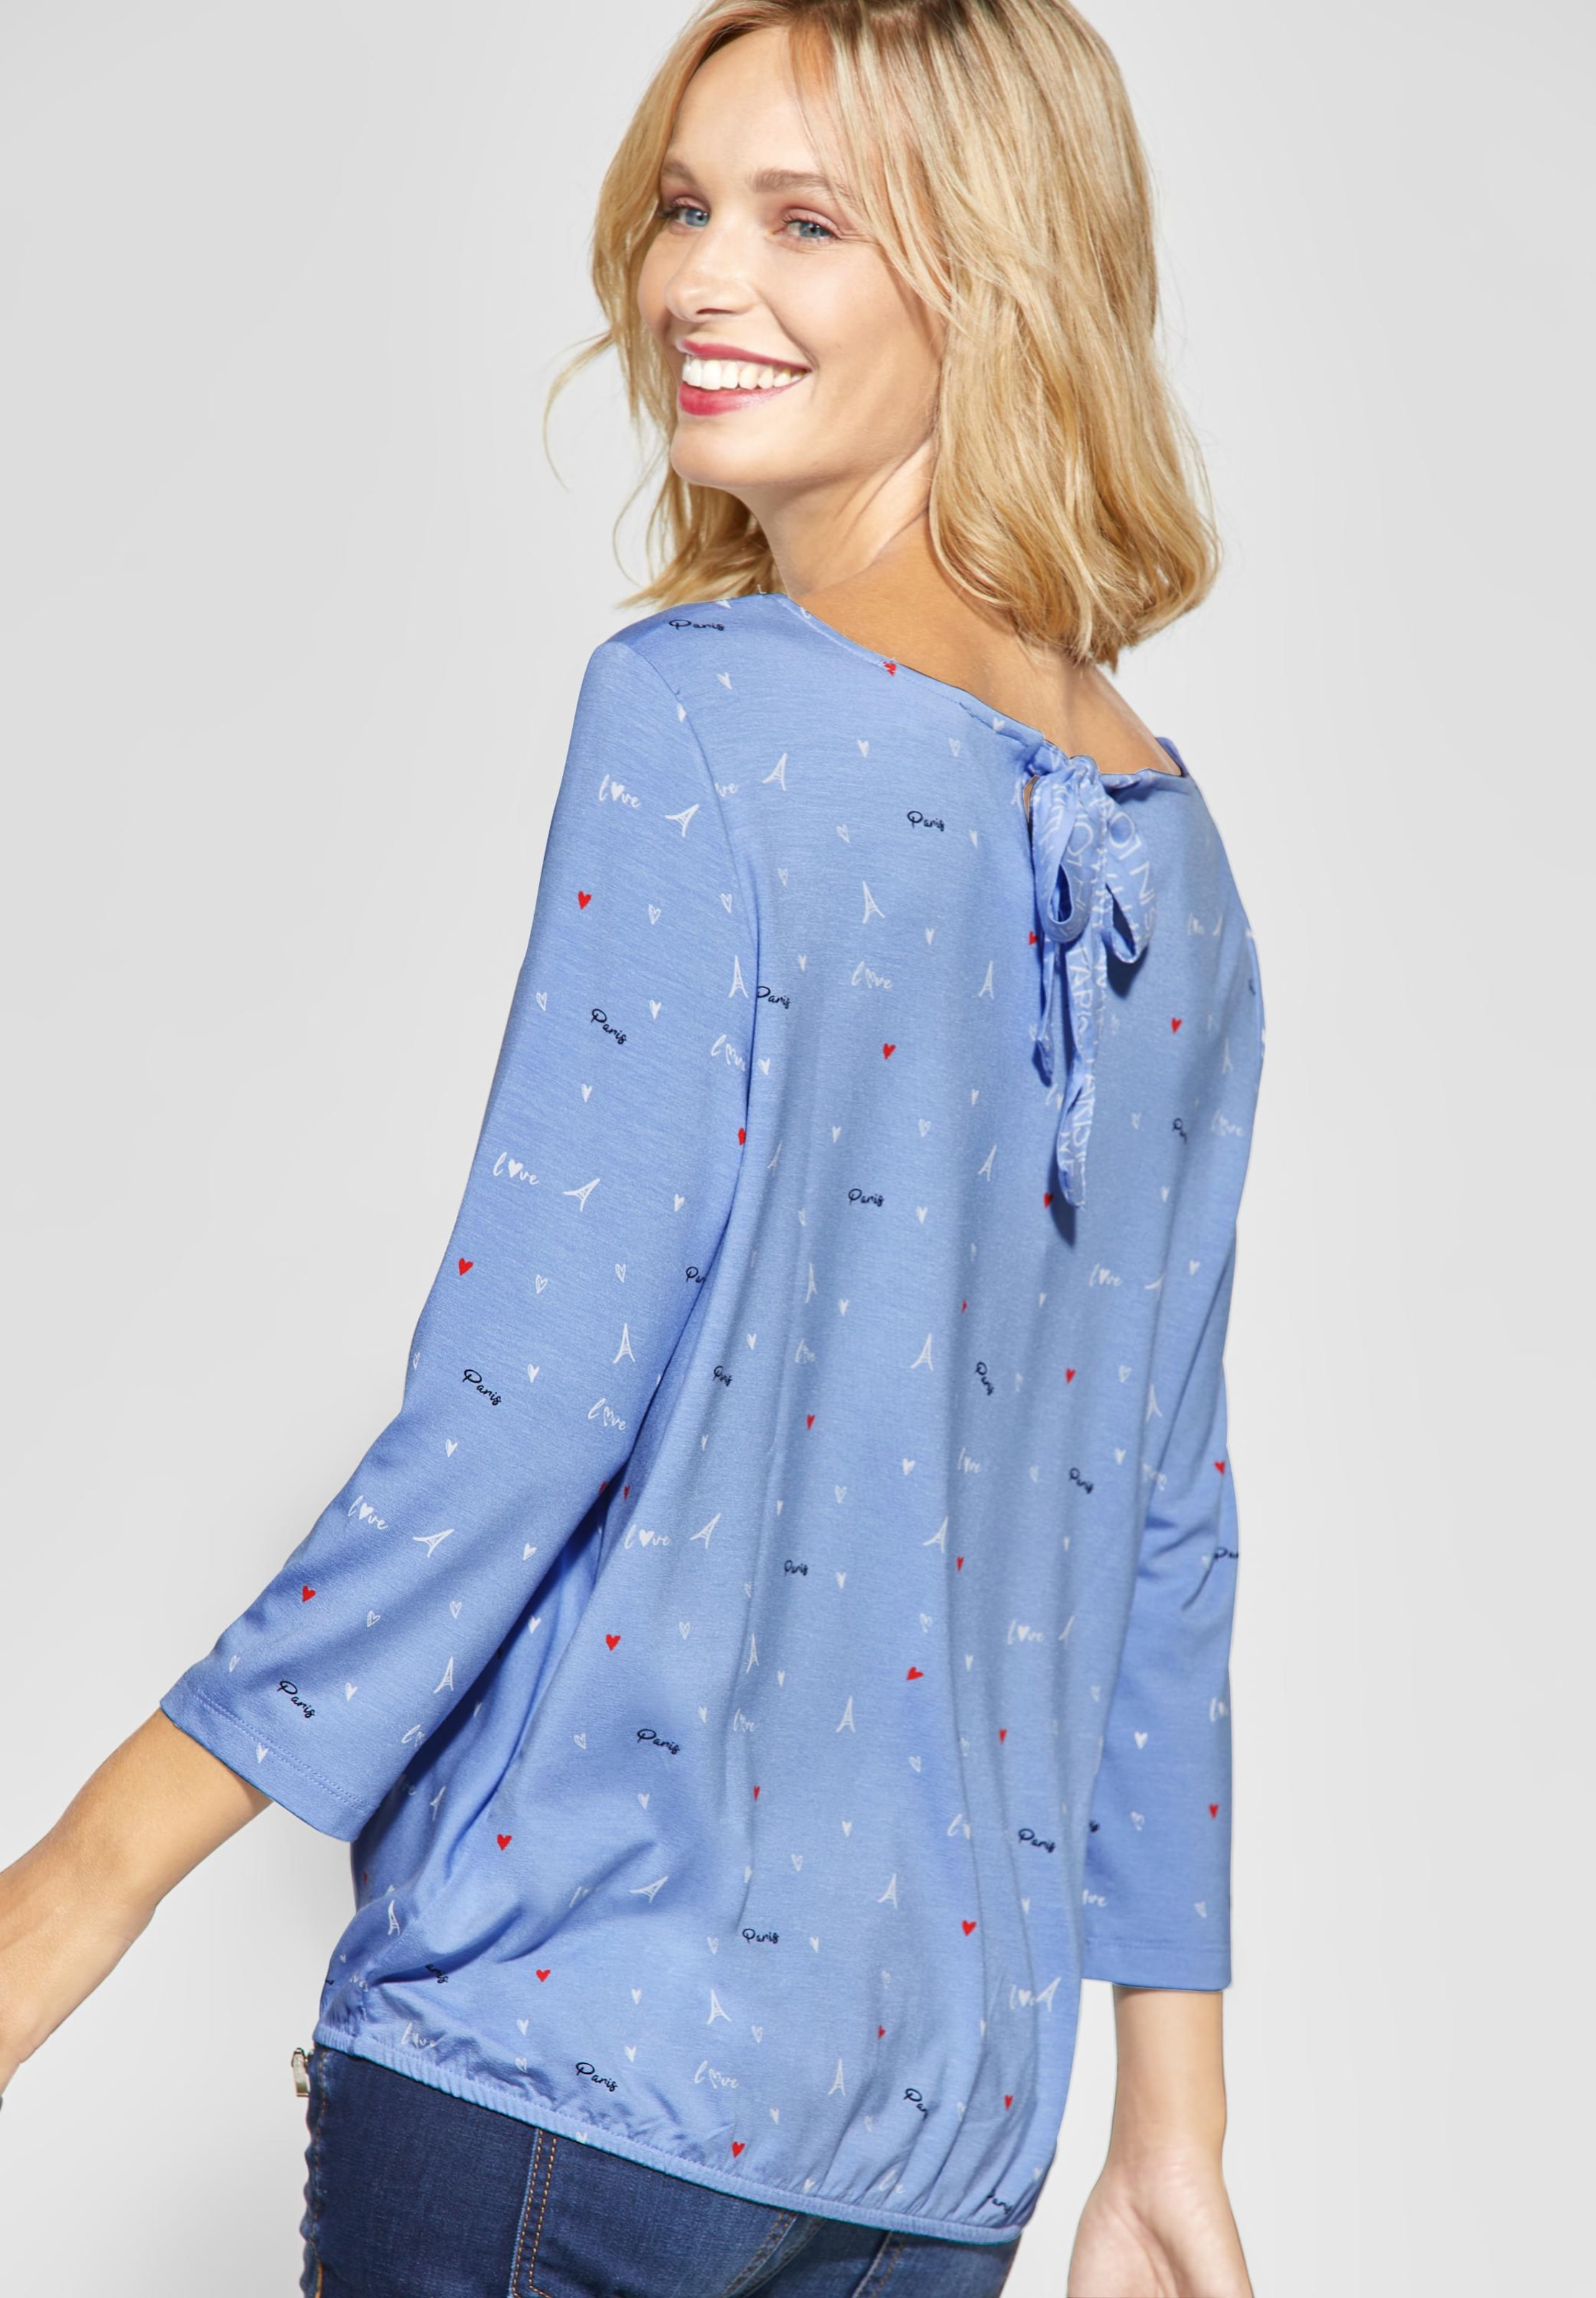 One In Blau Shirt Street W29EDHI